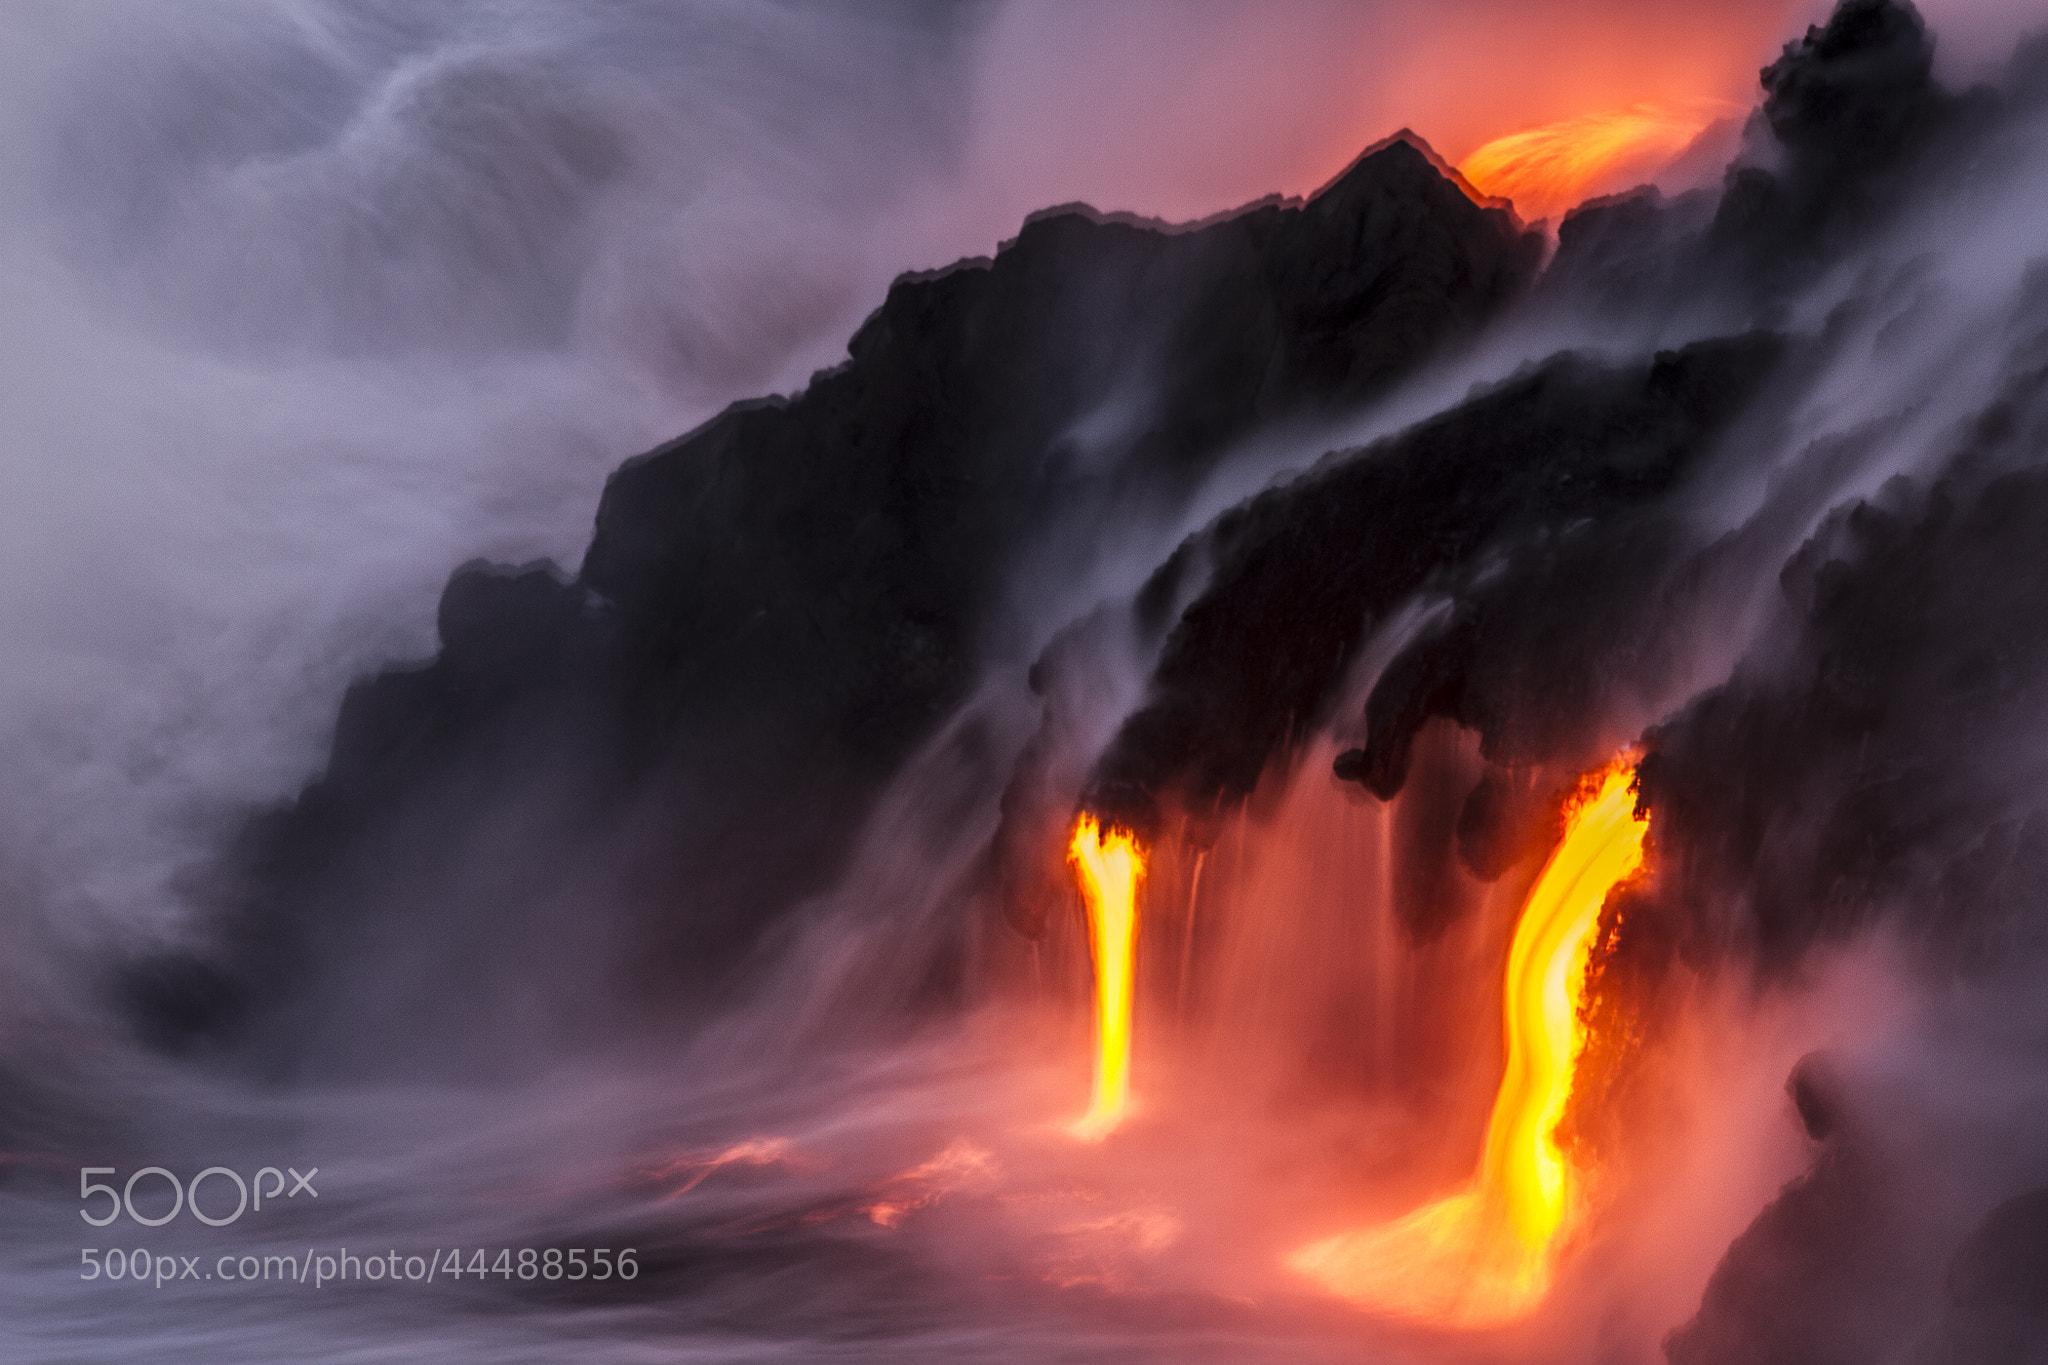 Photograph Lavafalls by Jordan Lacsina on 500px